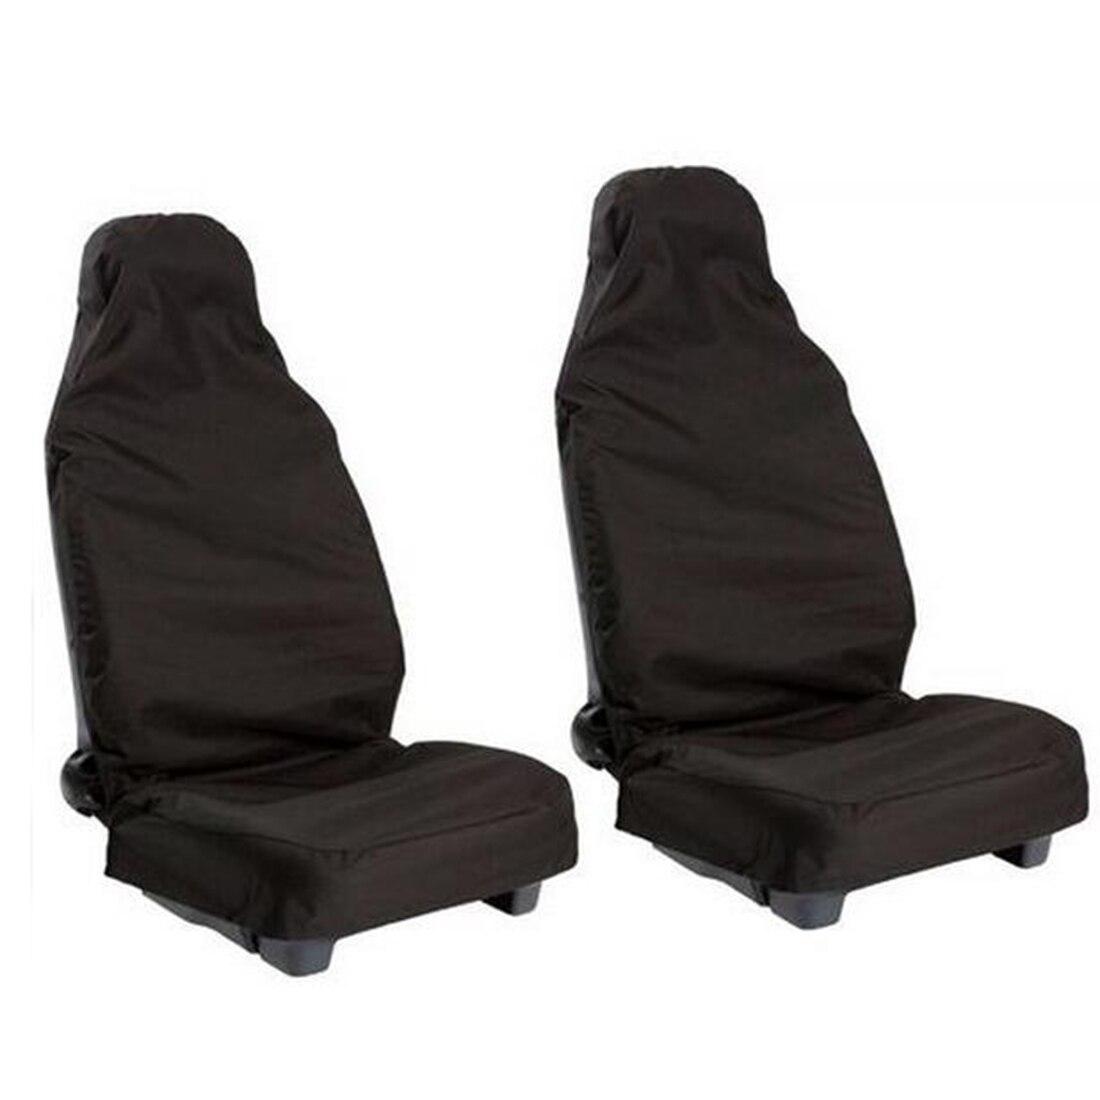 Dewtreetali 2Pcs Front Universal Waterproof Nylon Car Van Auto Vehicle Seat Cover Protector Free Shipping